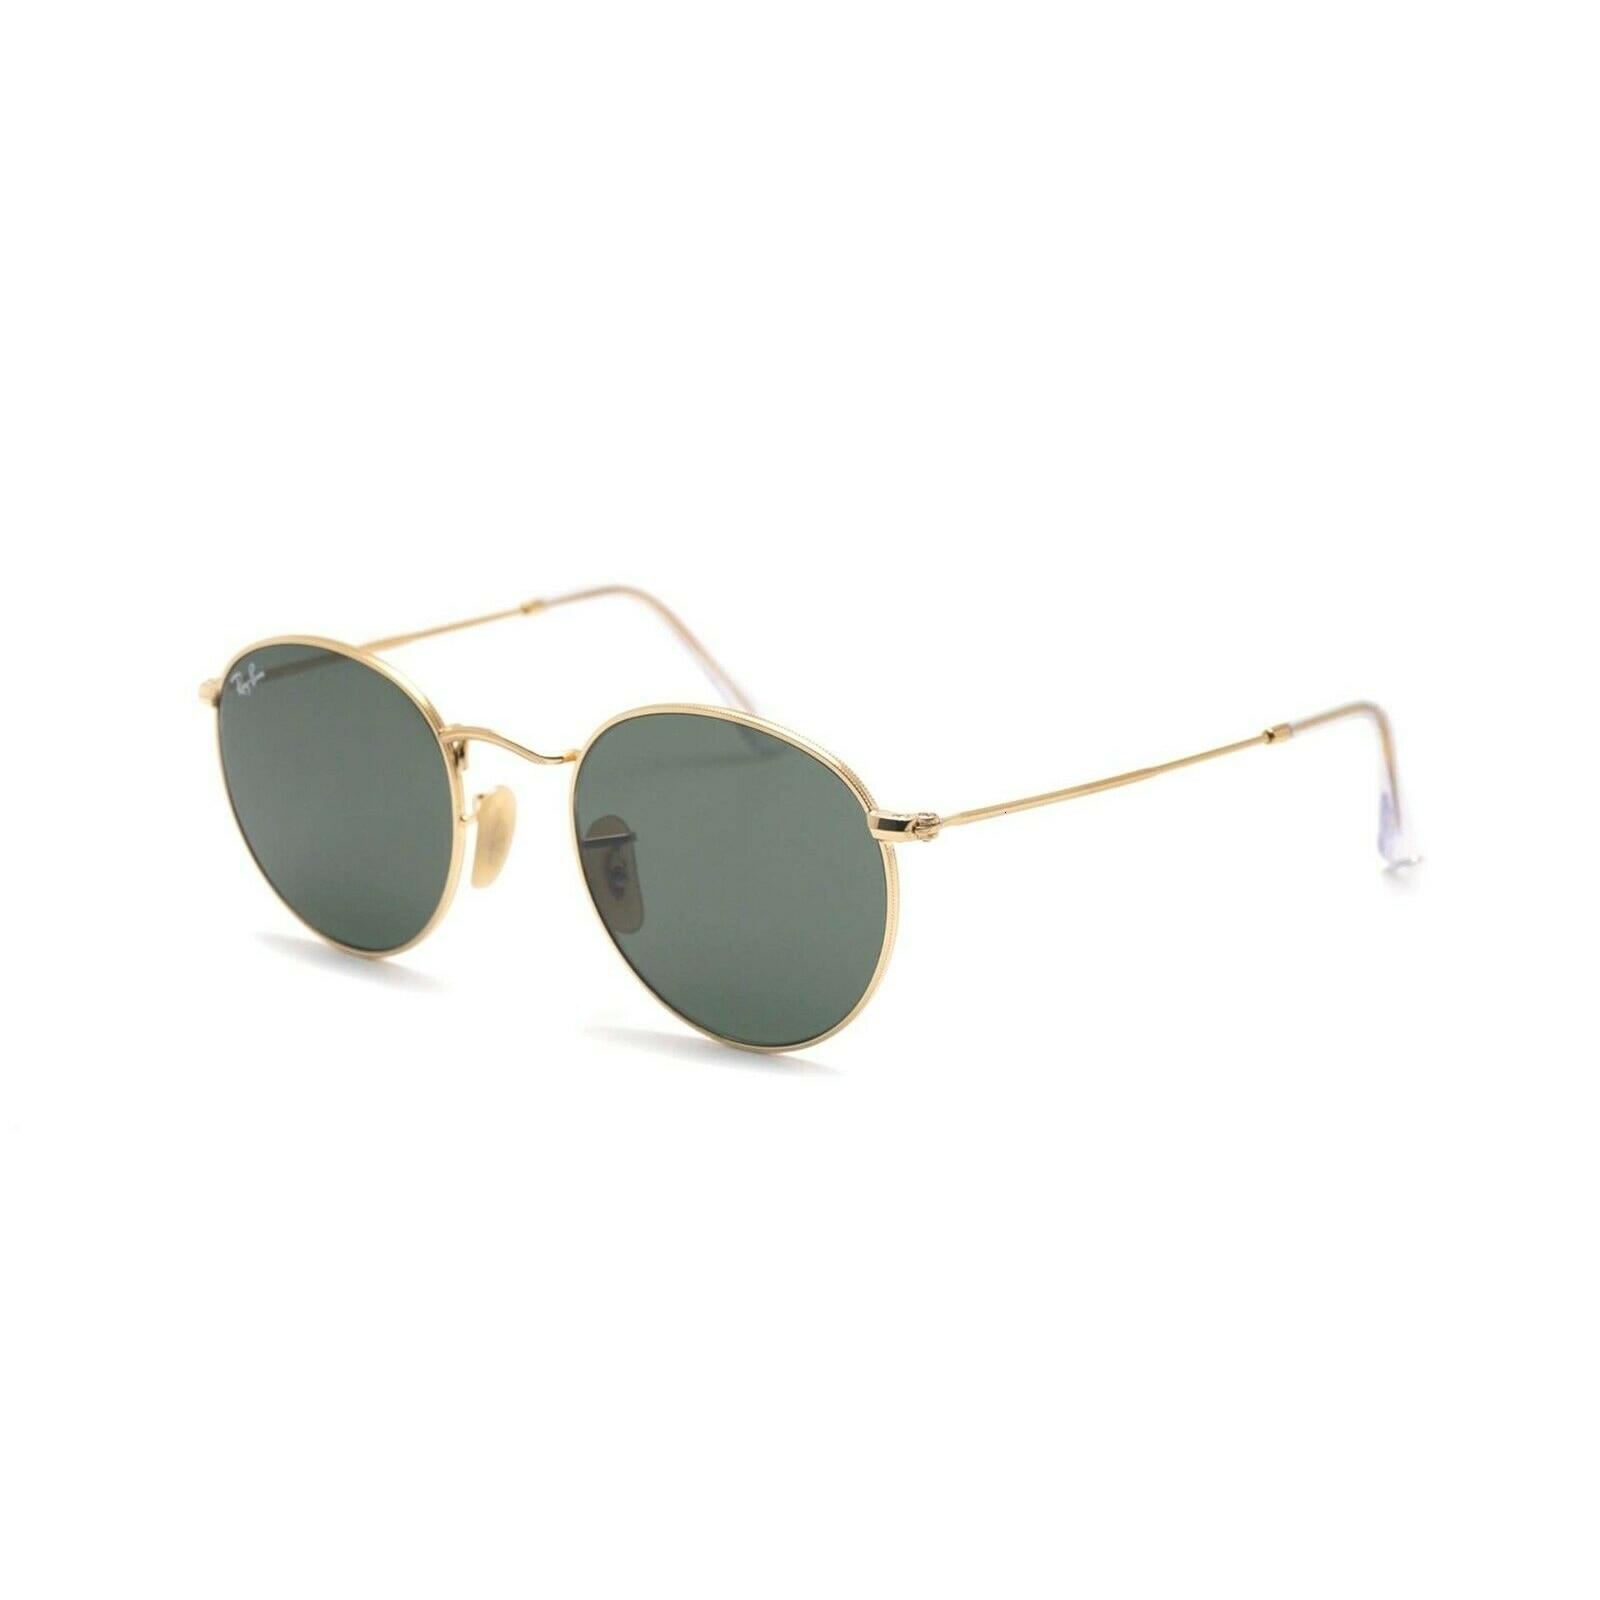 Gafas de sol Ray-Ban RB3447N, METAL redondo 001 ARISTA, CRISTAL VERDE Cal.53